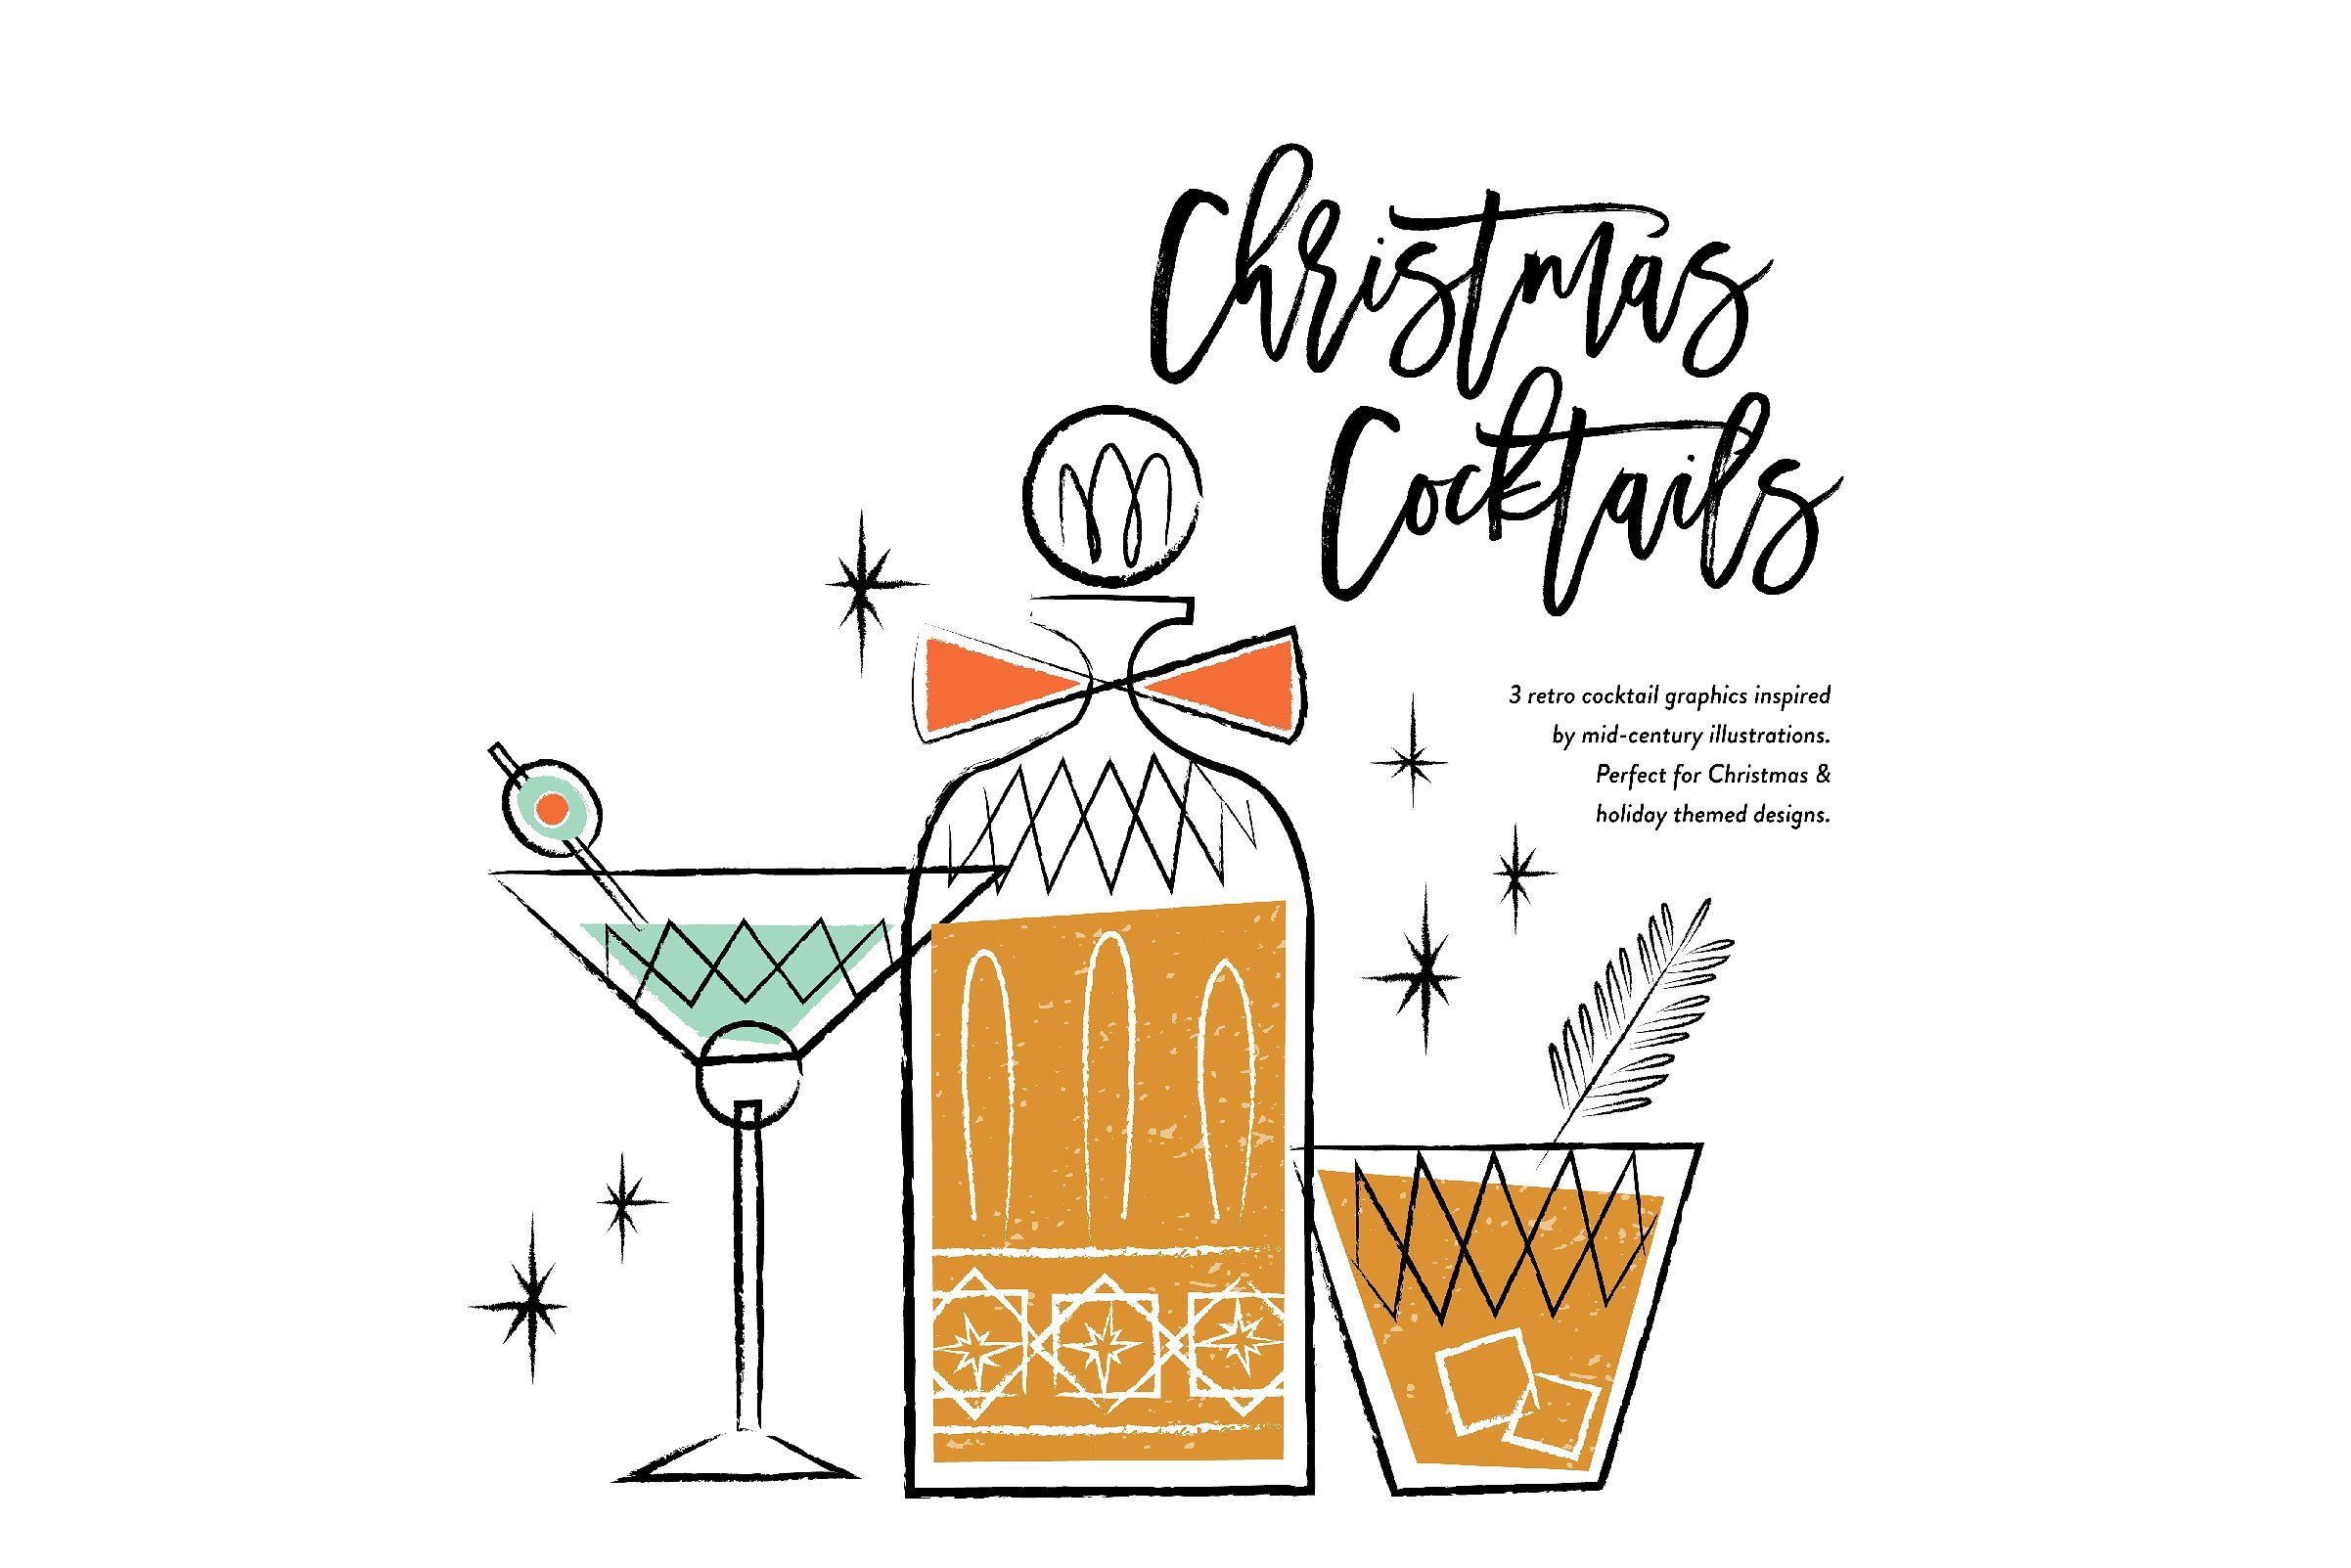 Vintage Christmas Cocktails #retro#holidays#cocktail